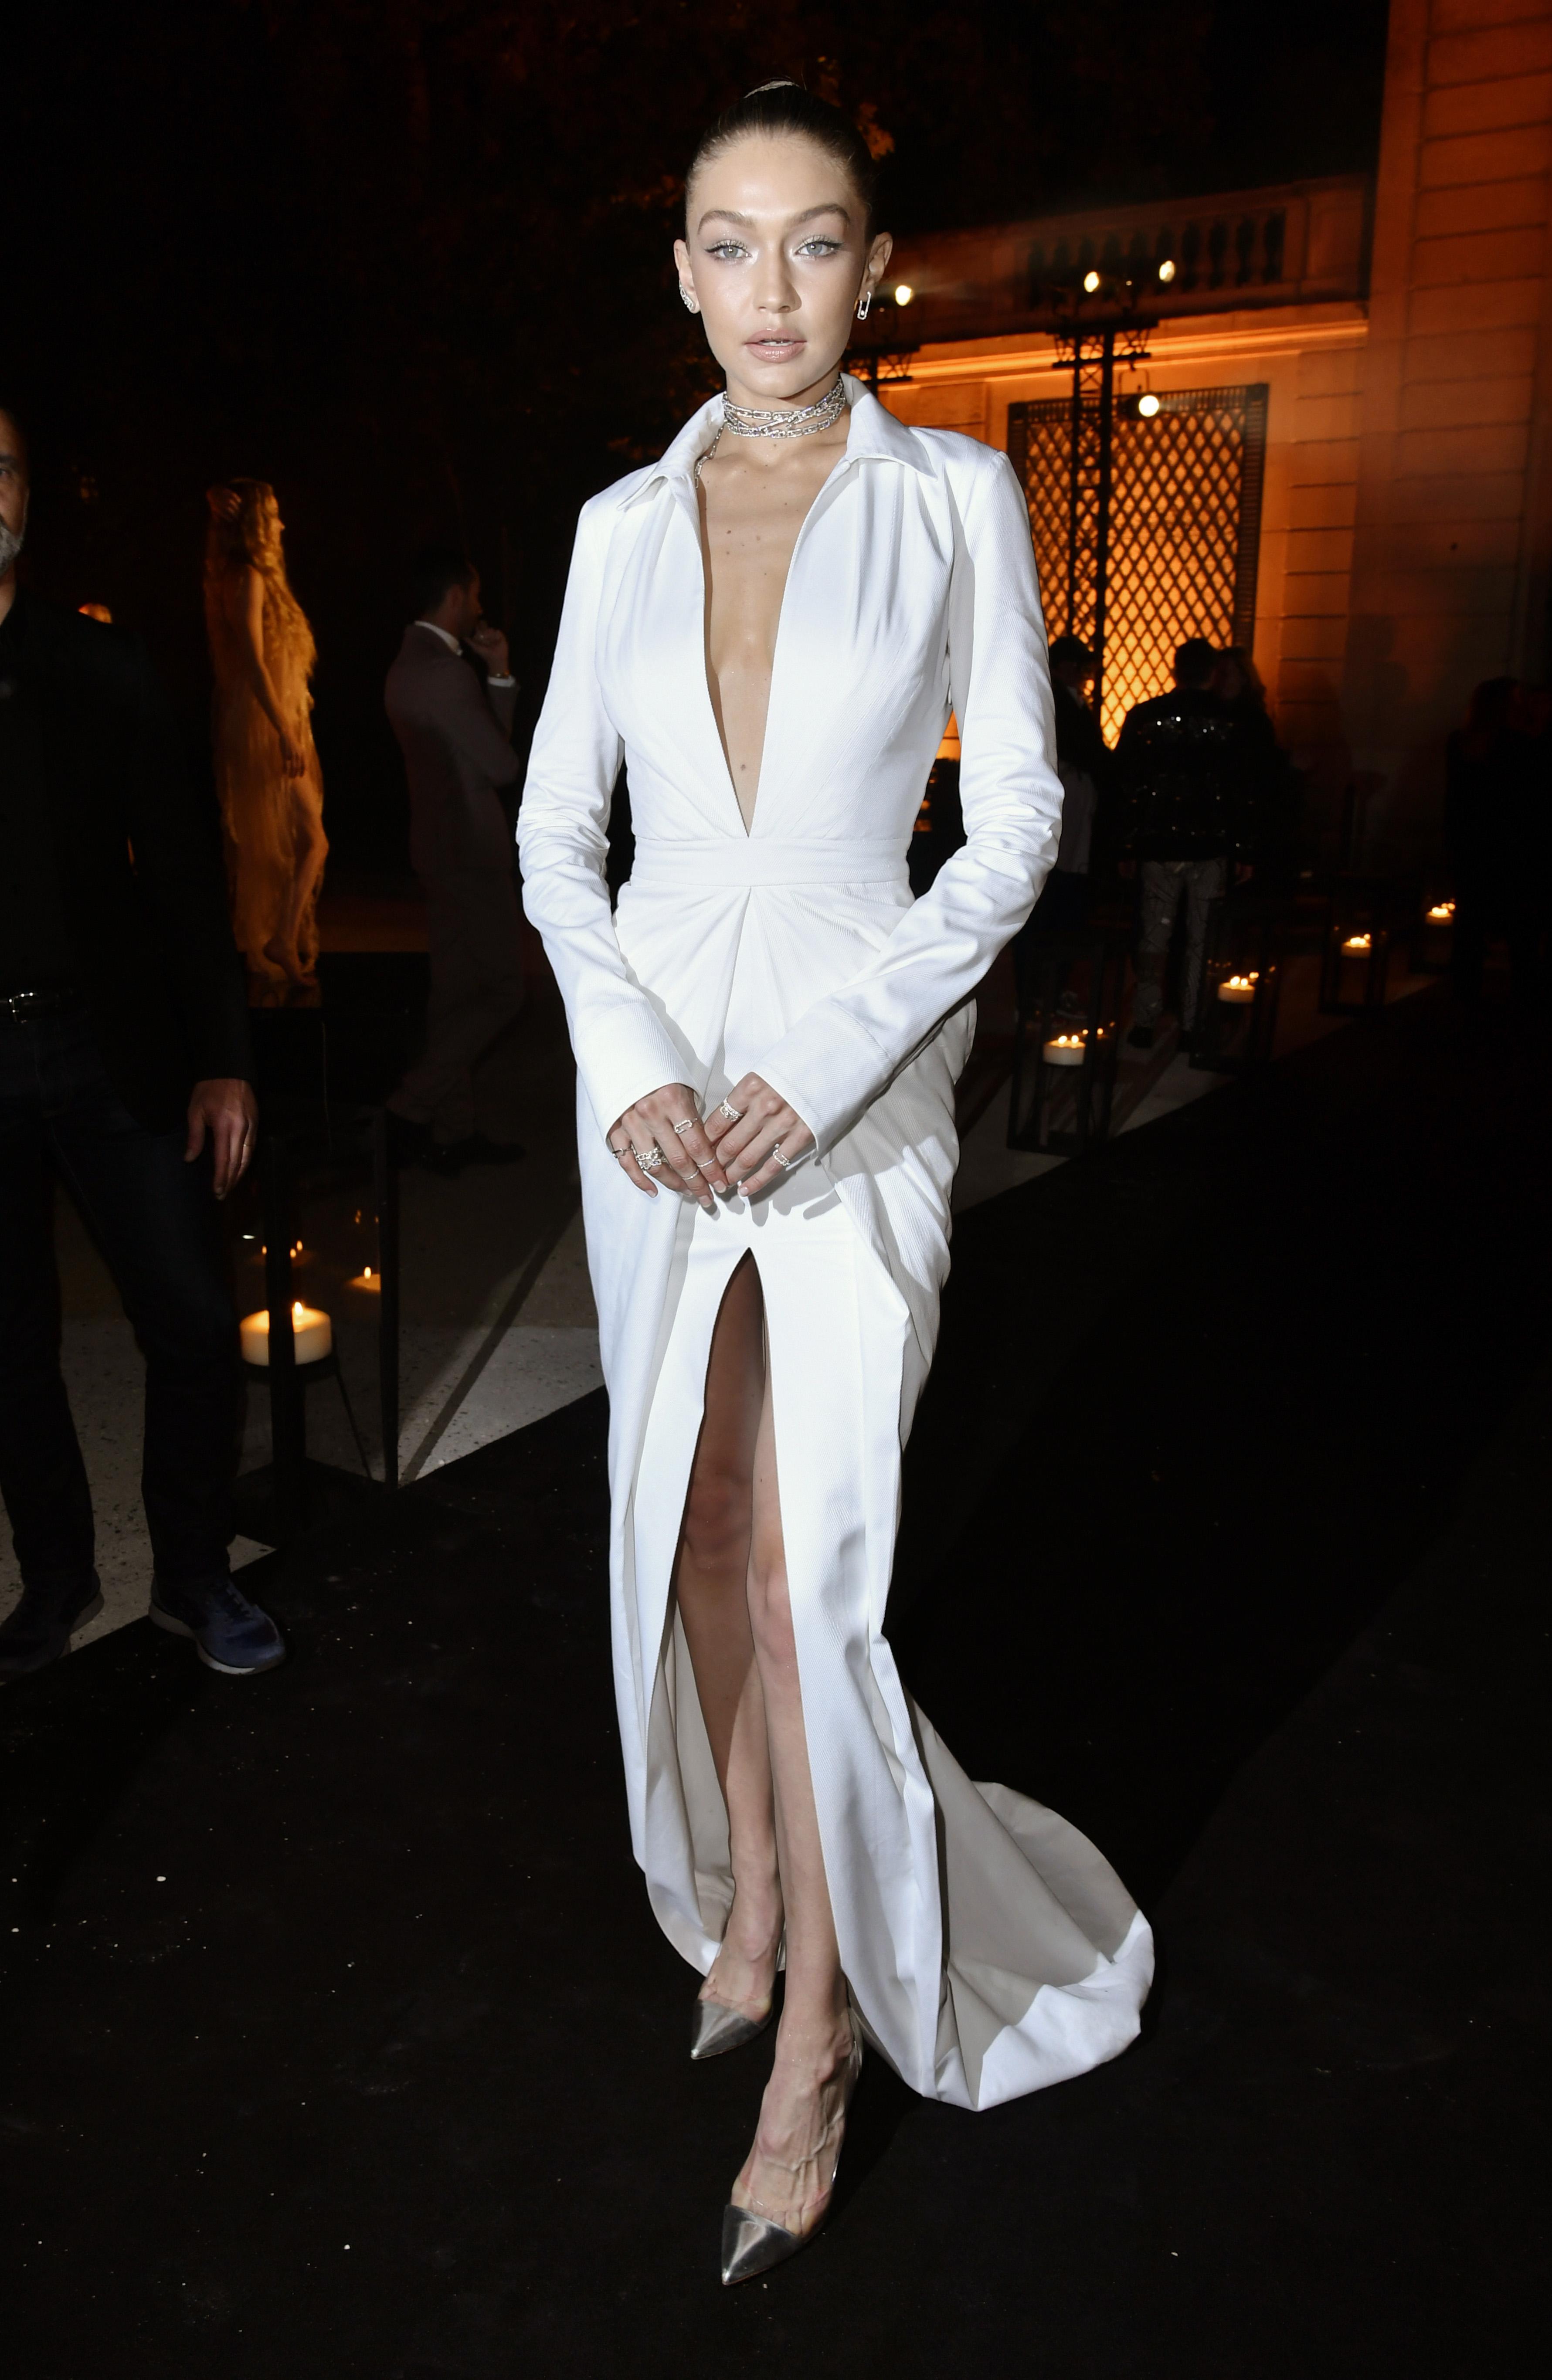 Gigi HadidMessika Cocktail Party, Spring Summer 2018, Paris Fashion Week, France - 27 Sep 2017 WEARING BRANDON MAXWELL SAME OUTFIT AS CATWALK MODEL BELLA HADID *9050198an